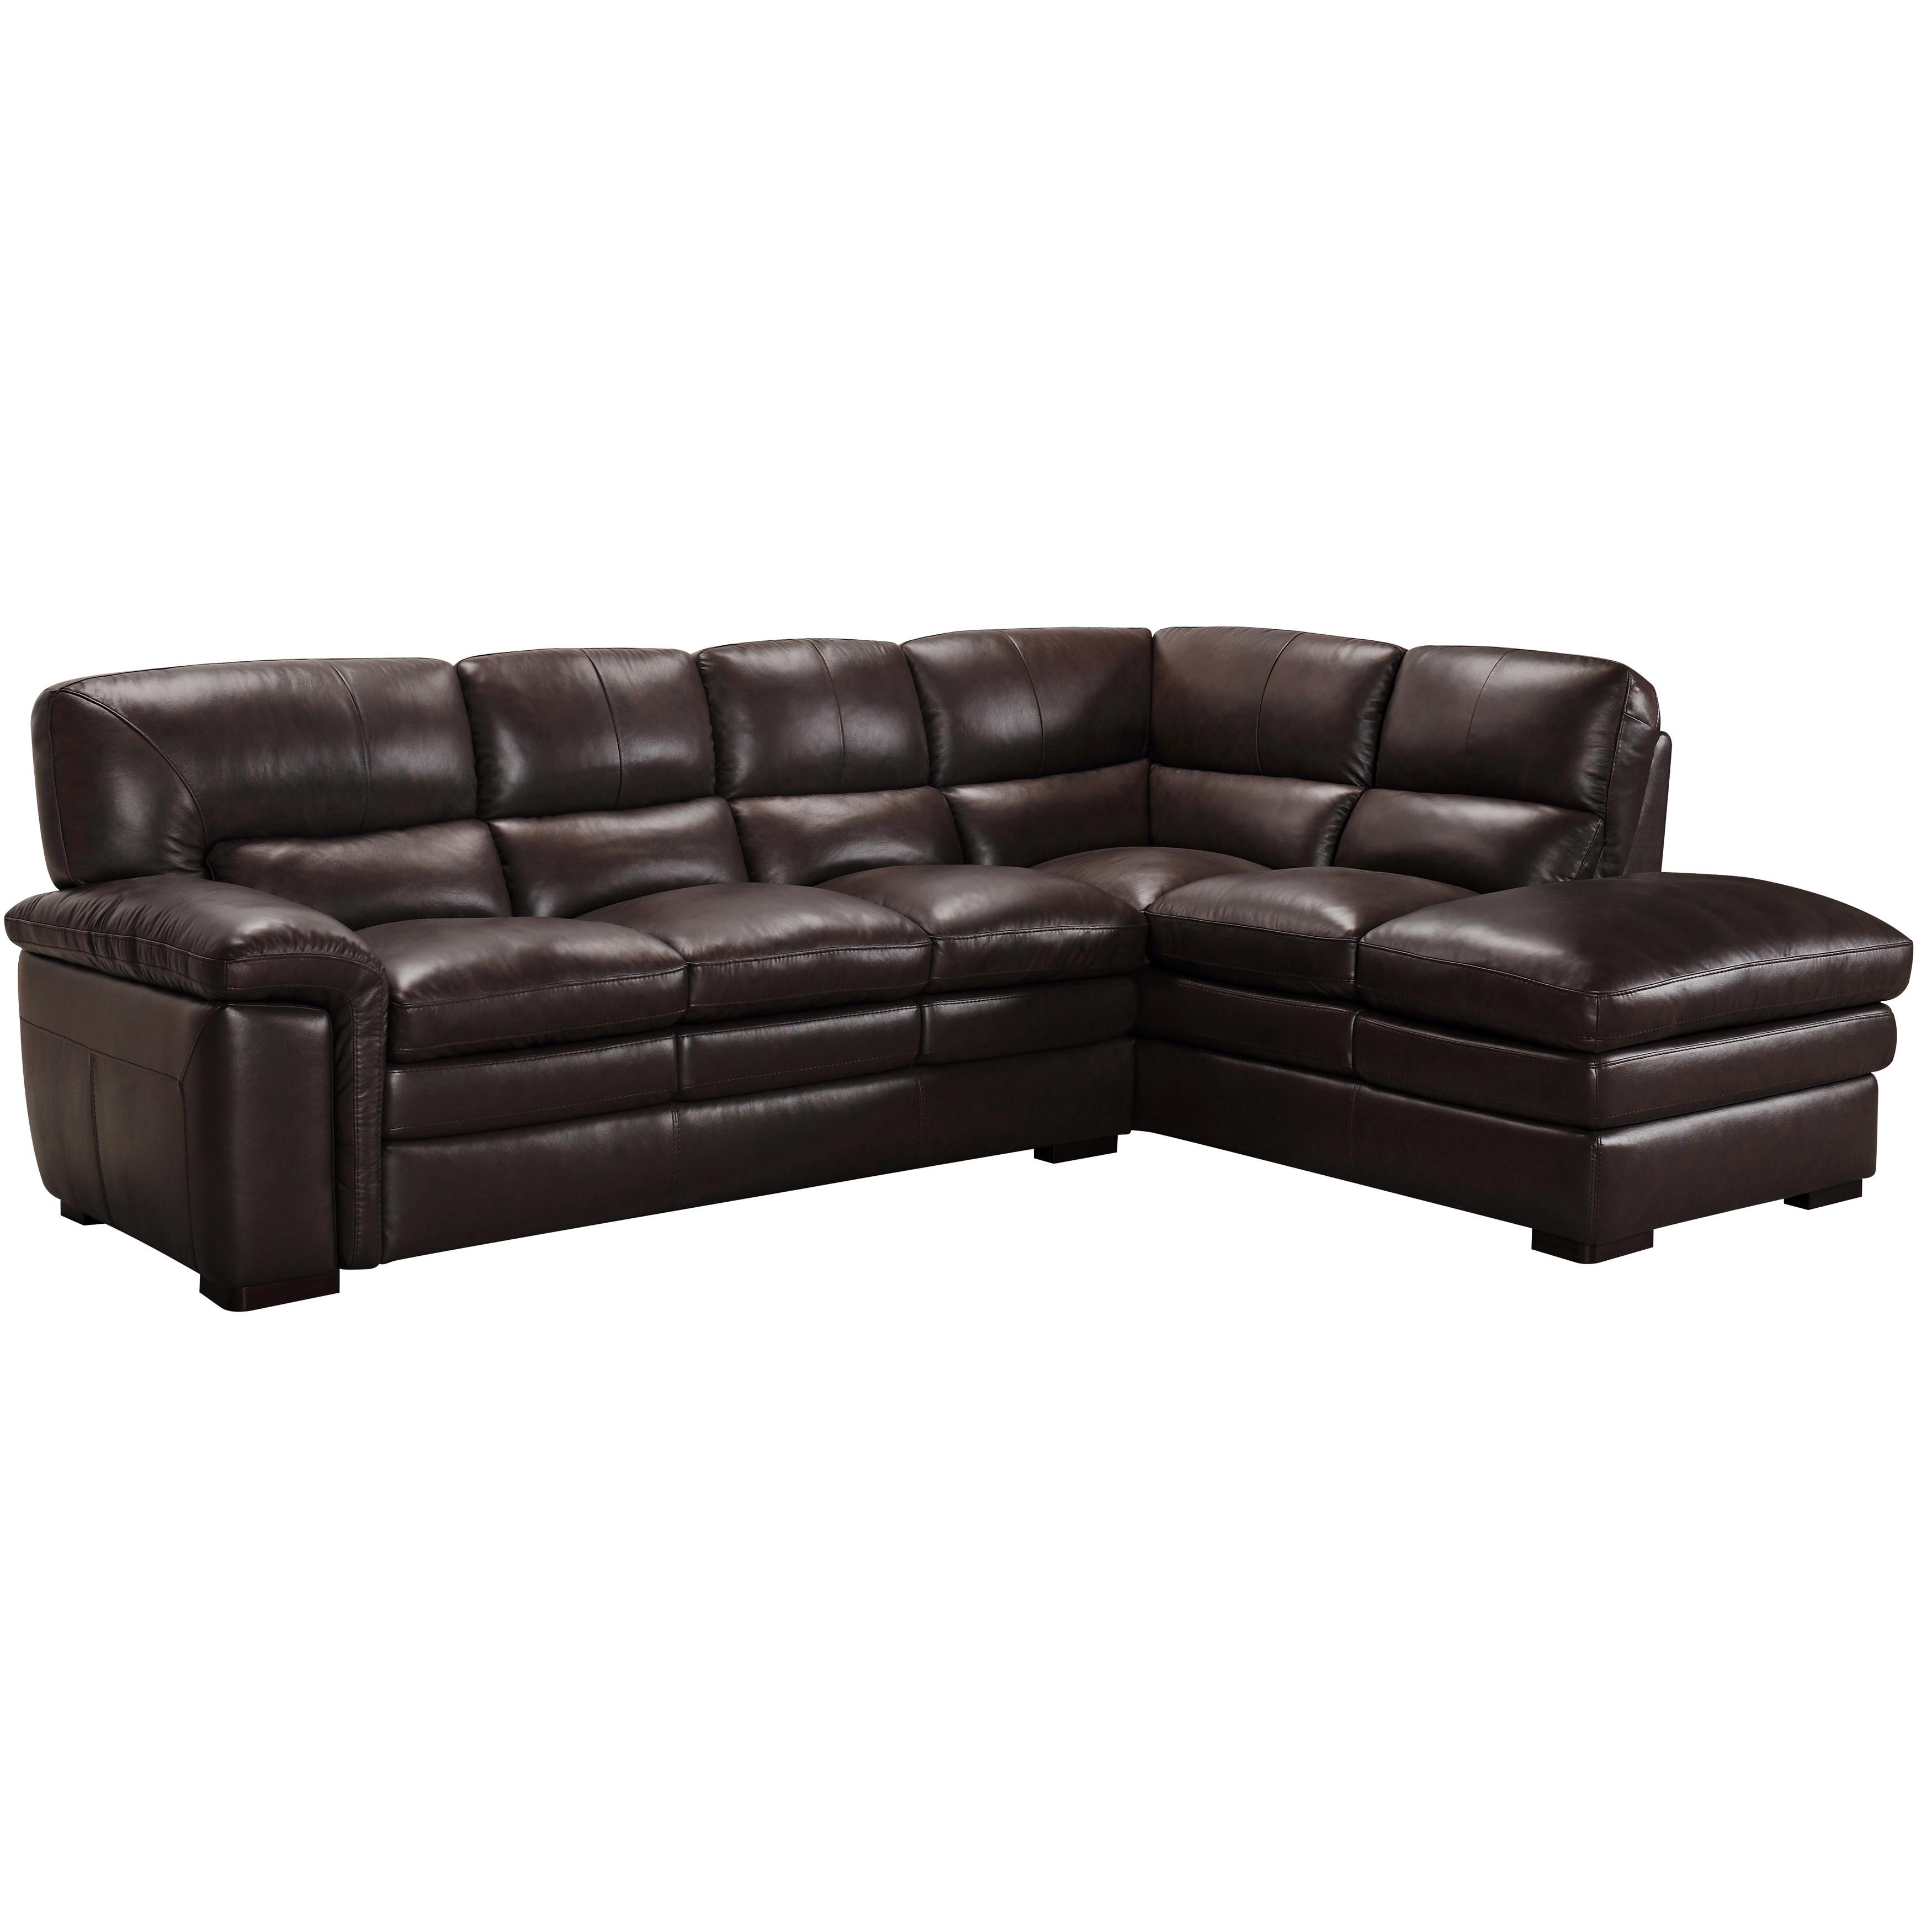 Portland Premium Top Grain Brown Leather Sectional Sofa – Free Within Portland Or Sectional Sofas (Image 4 of 10)